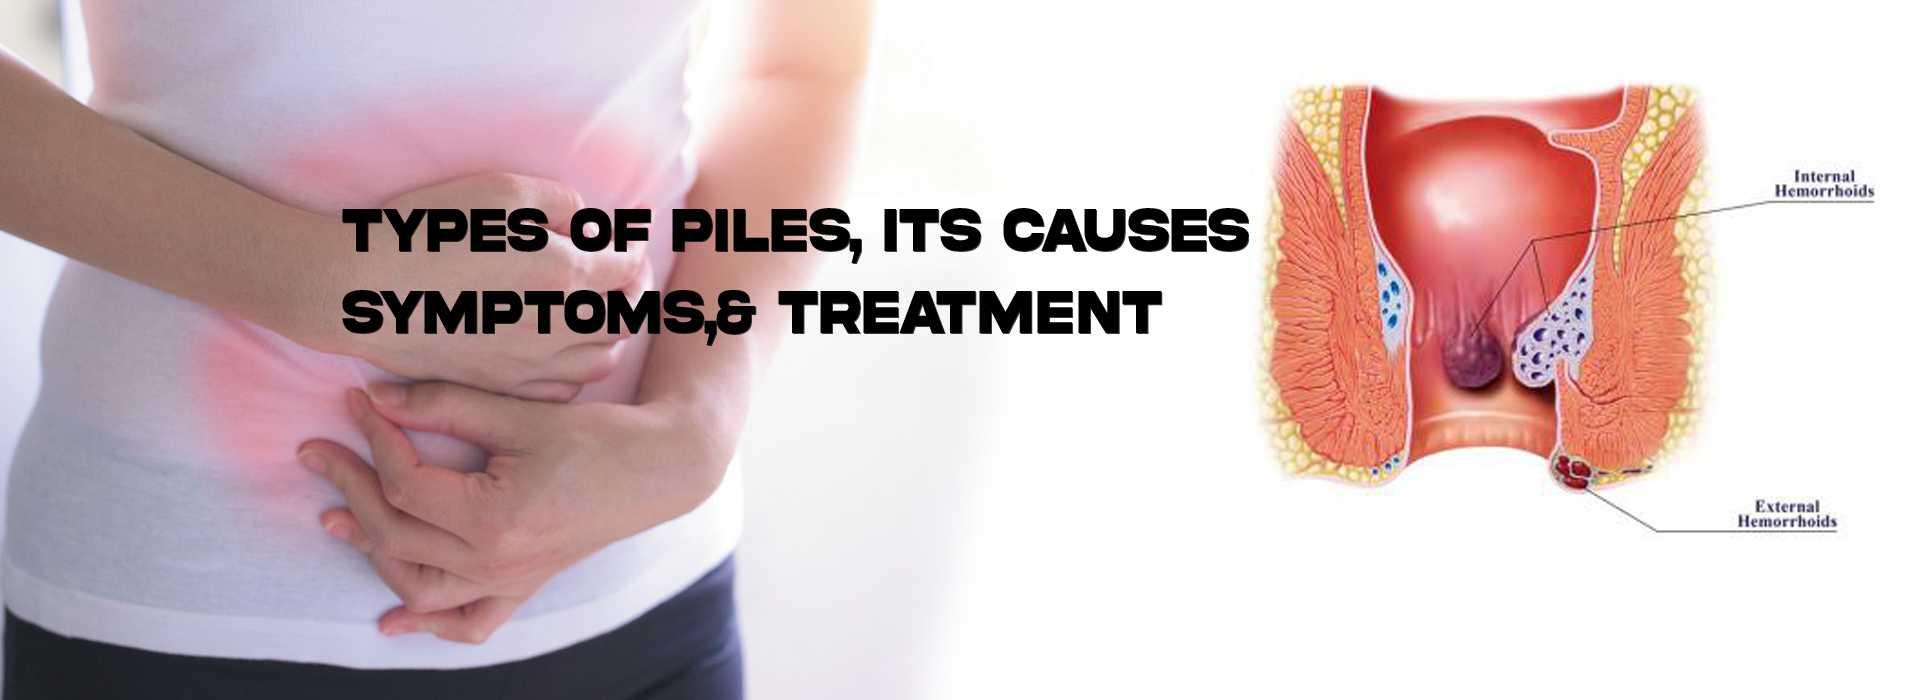 types of piles